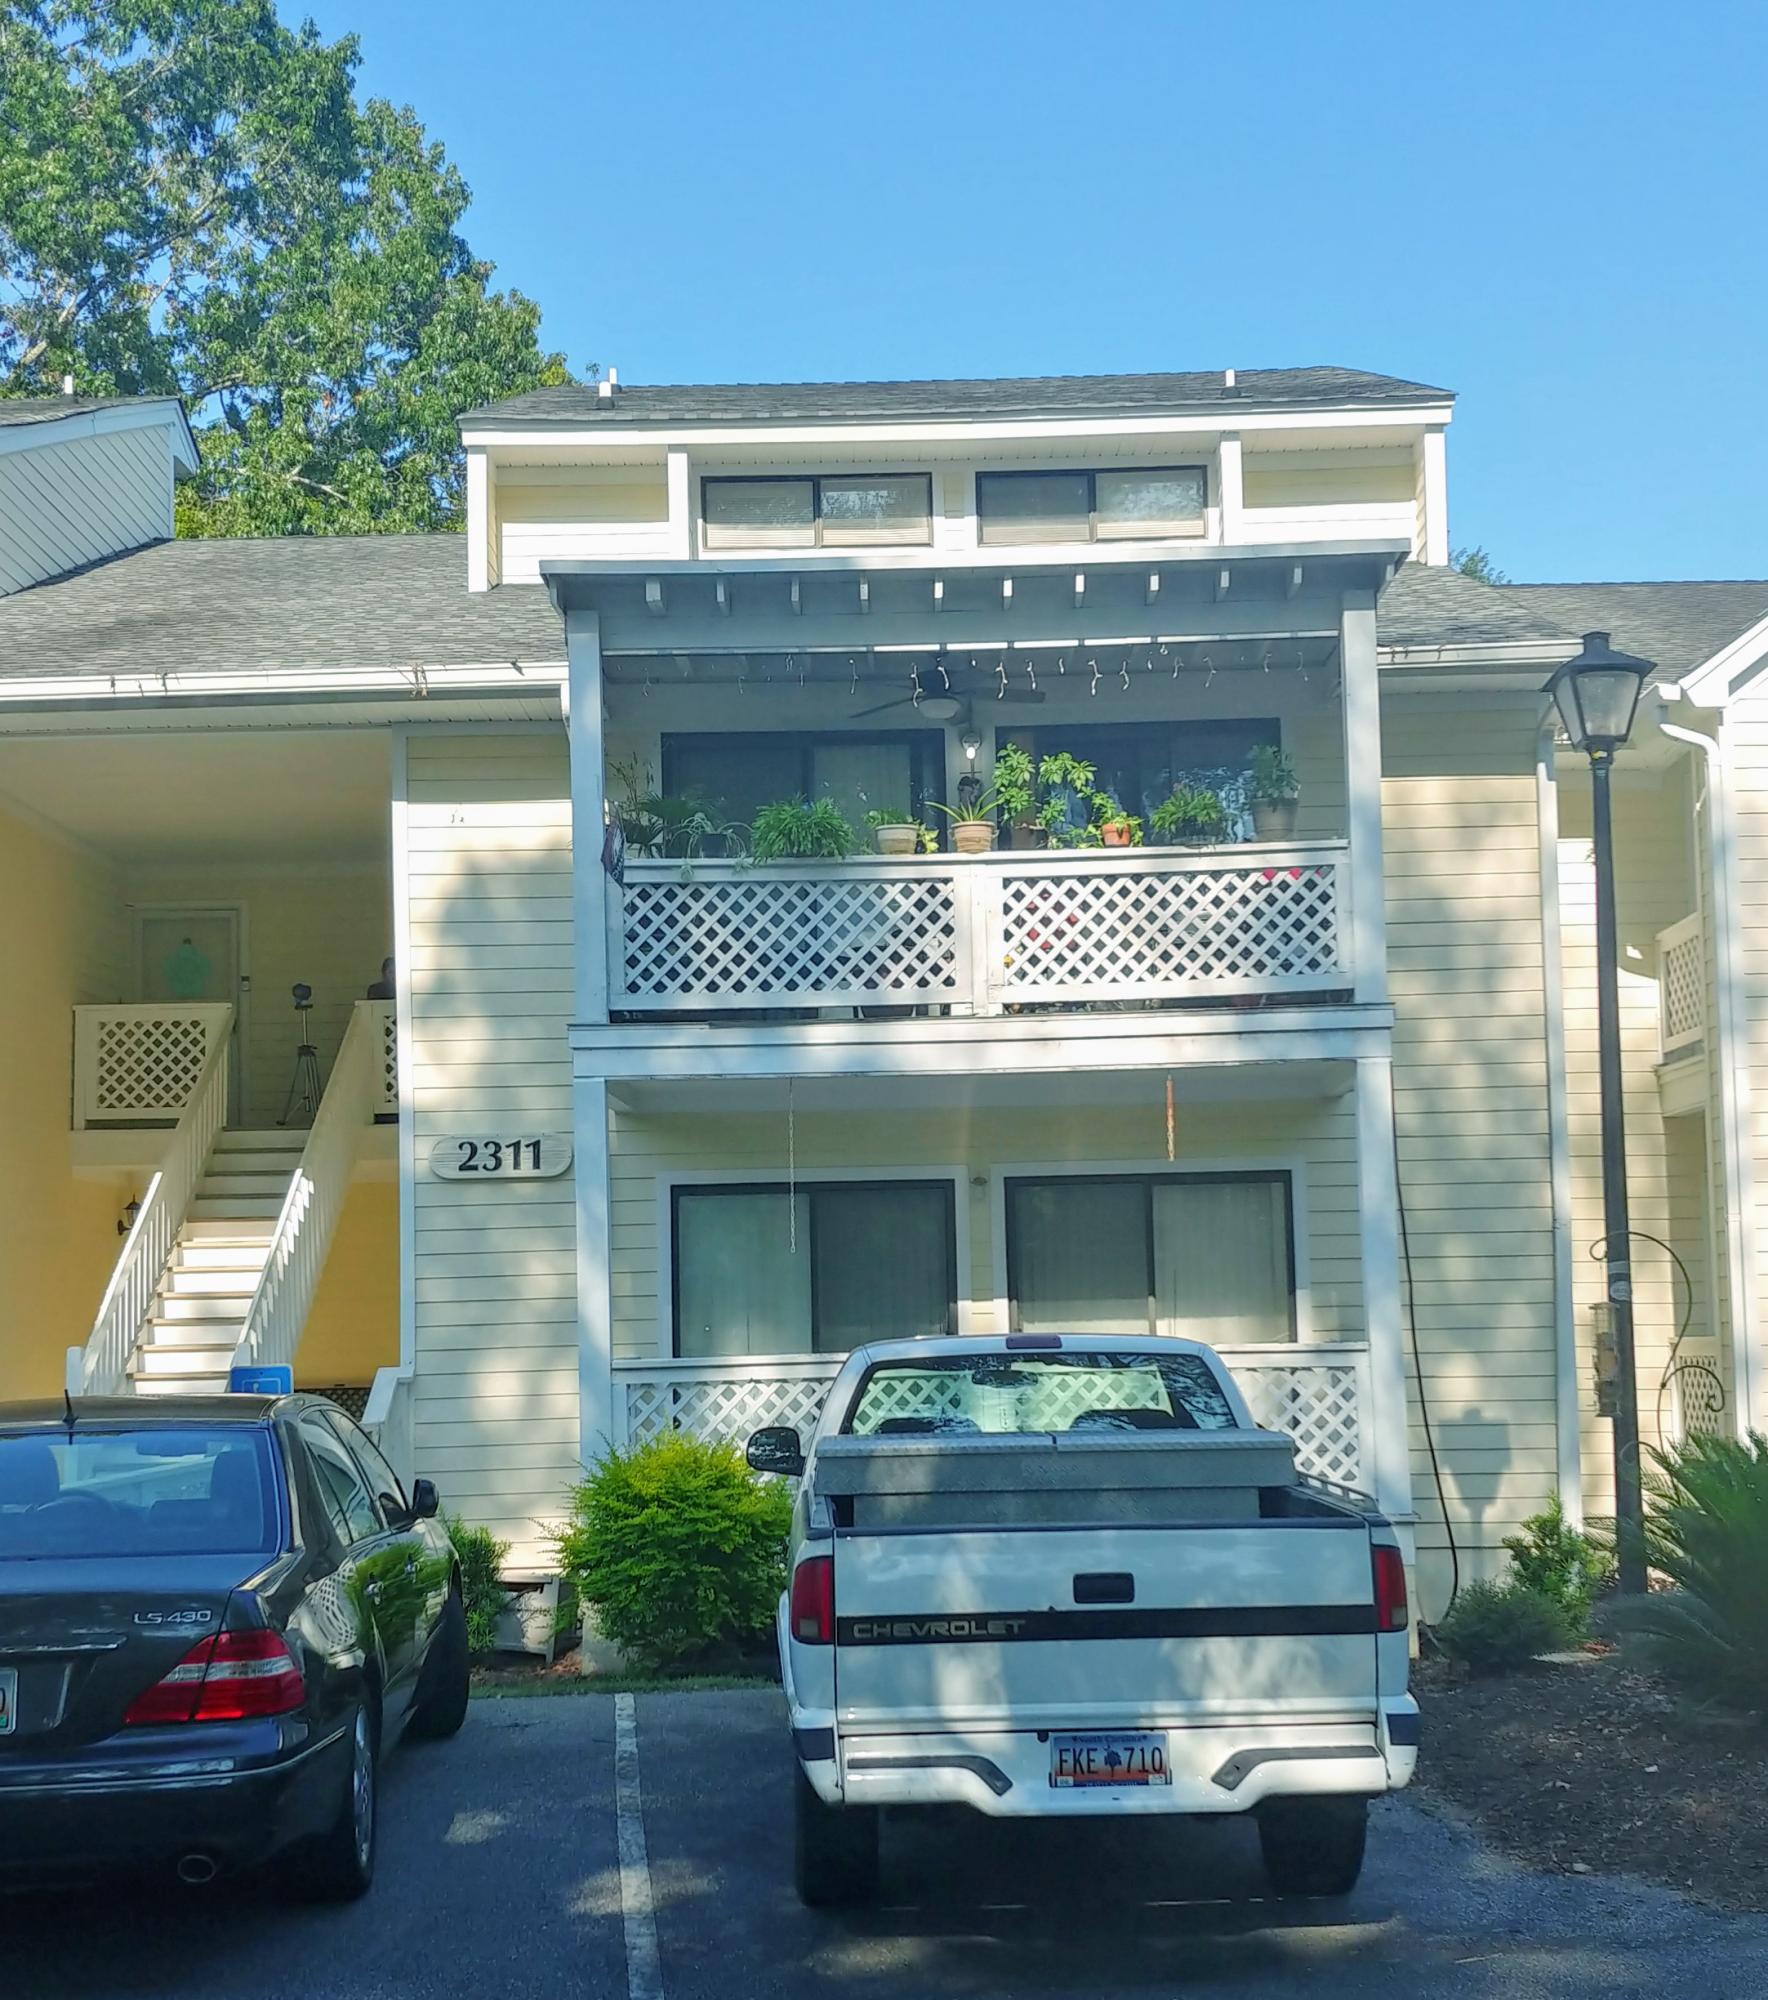 Seagate Condos Homes For Sale - 2311 Tall Sail, Charleston, SC - 25